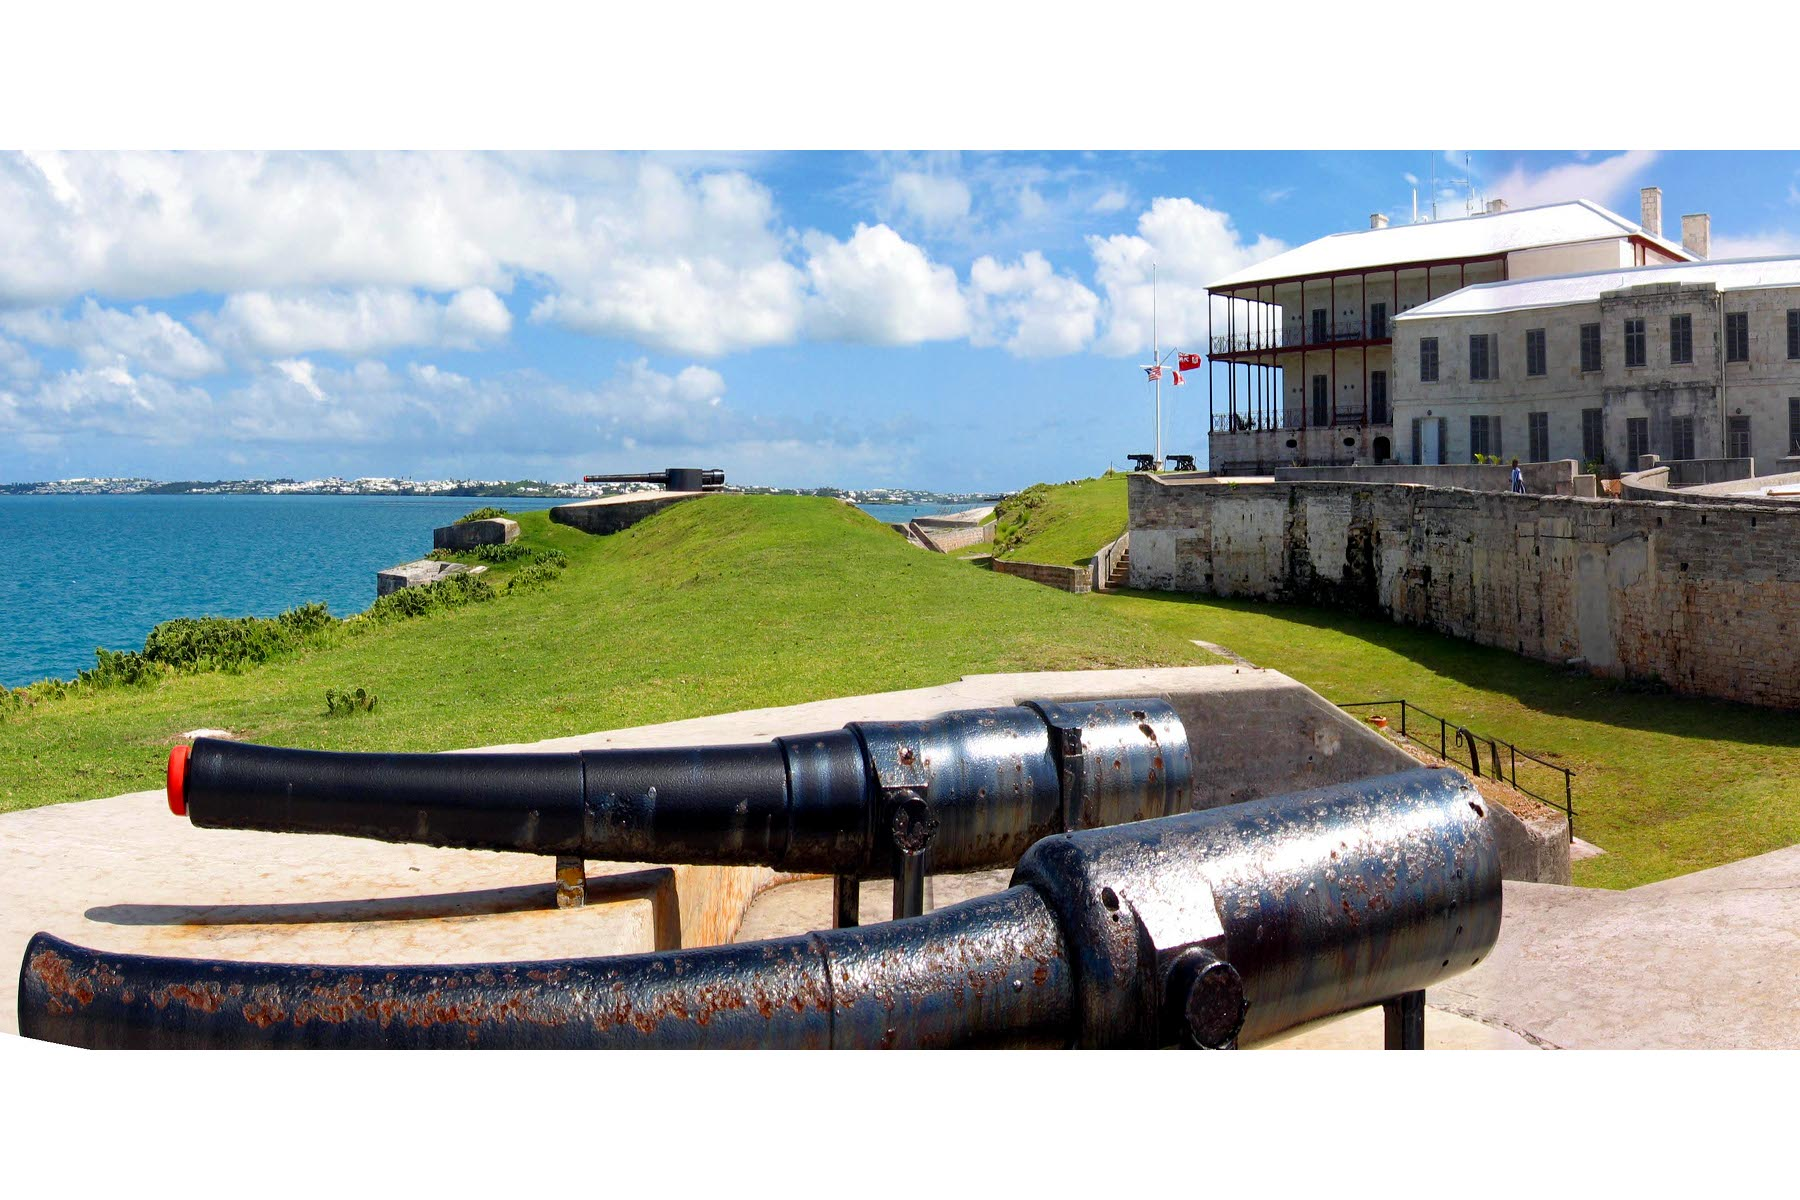 Royal Naval Dockyard, West End, Bermuda